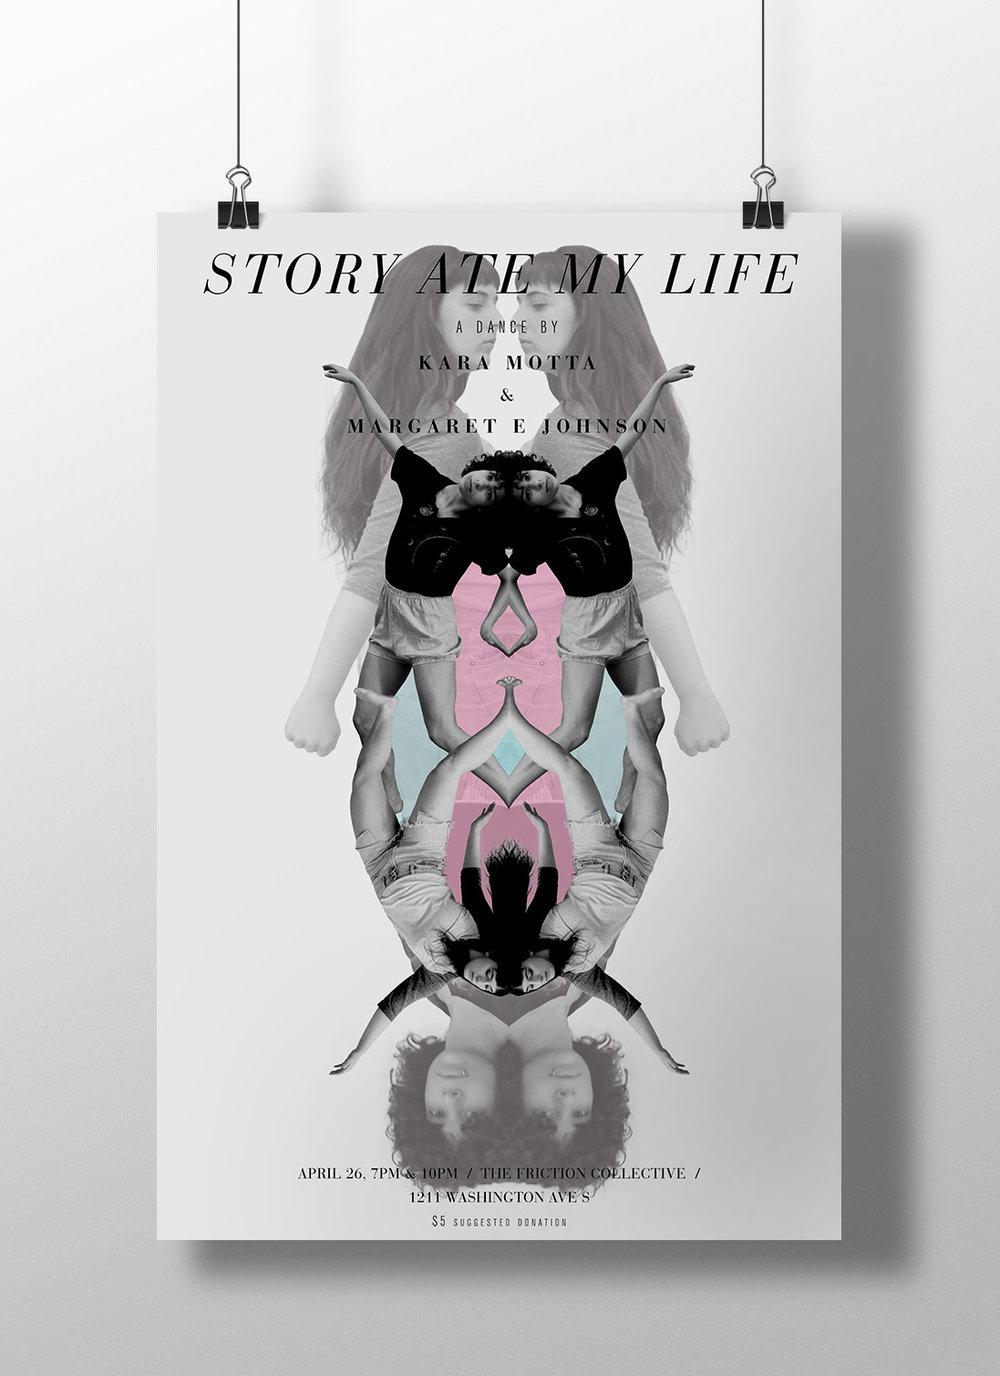 Poster / Story Ate My Life - A Dance by Kara Motta & Margaret E. Johnson